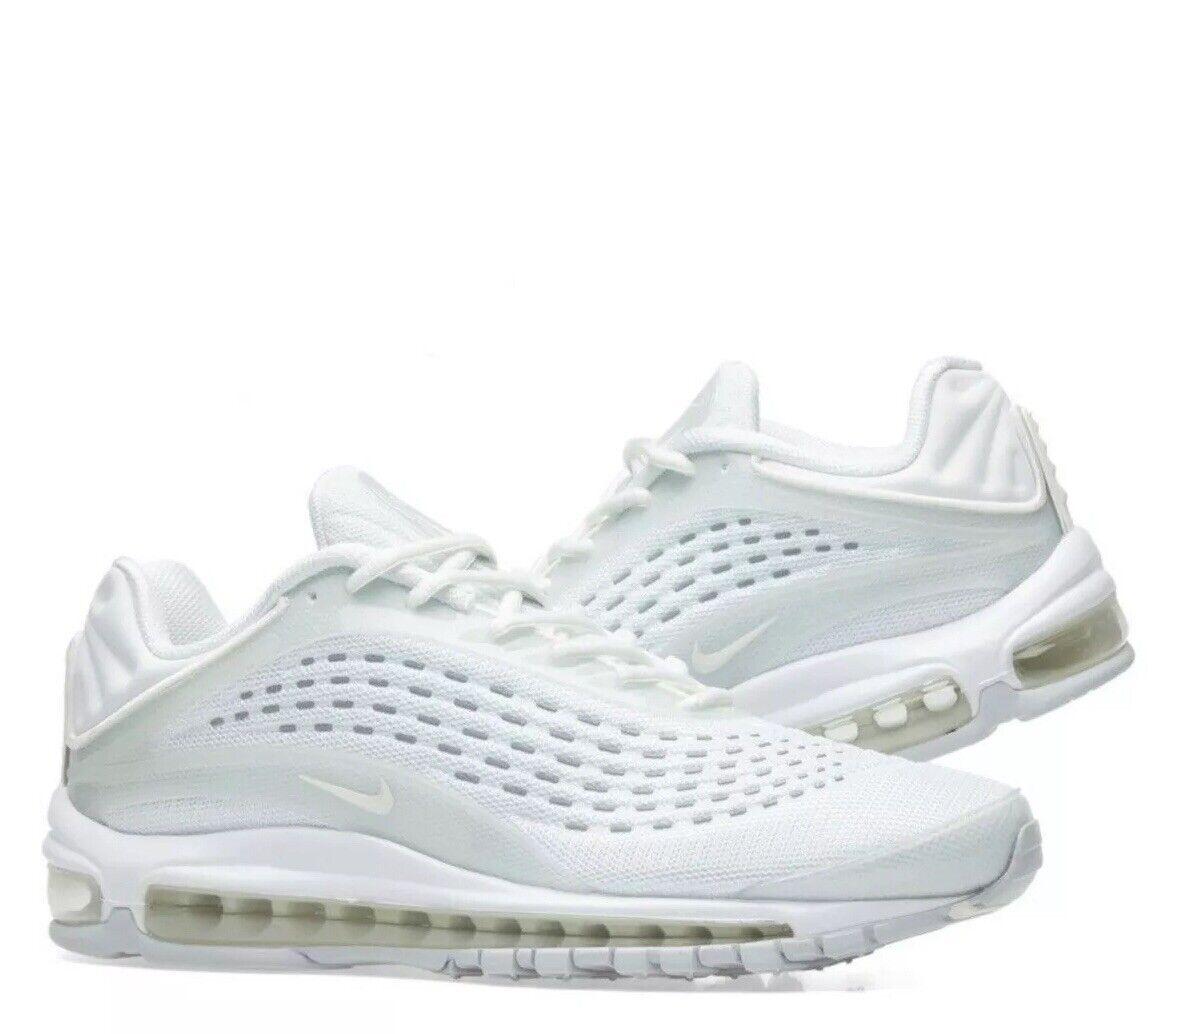 Zapatos deportivos blancoos de oro blancoo, talla inglesa 5, av2589 100.